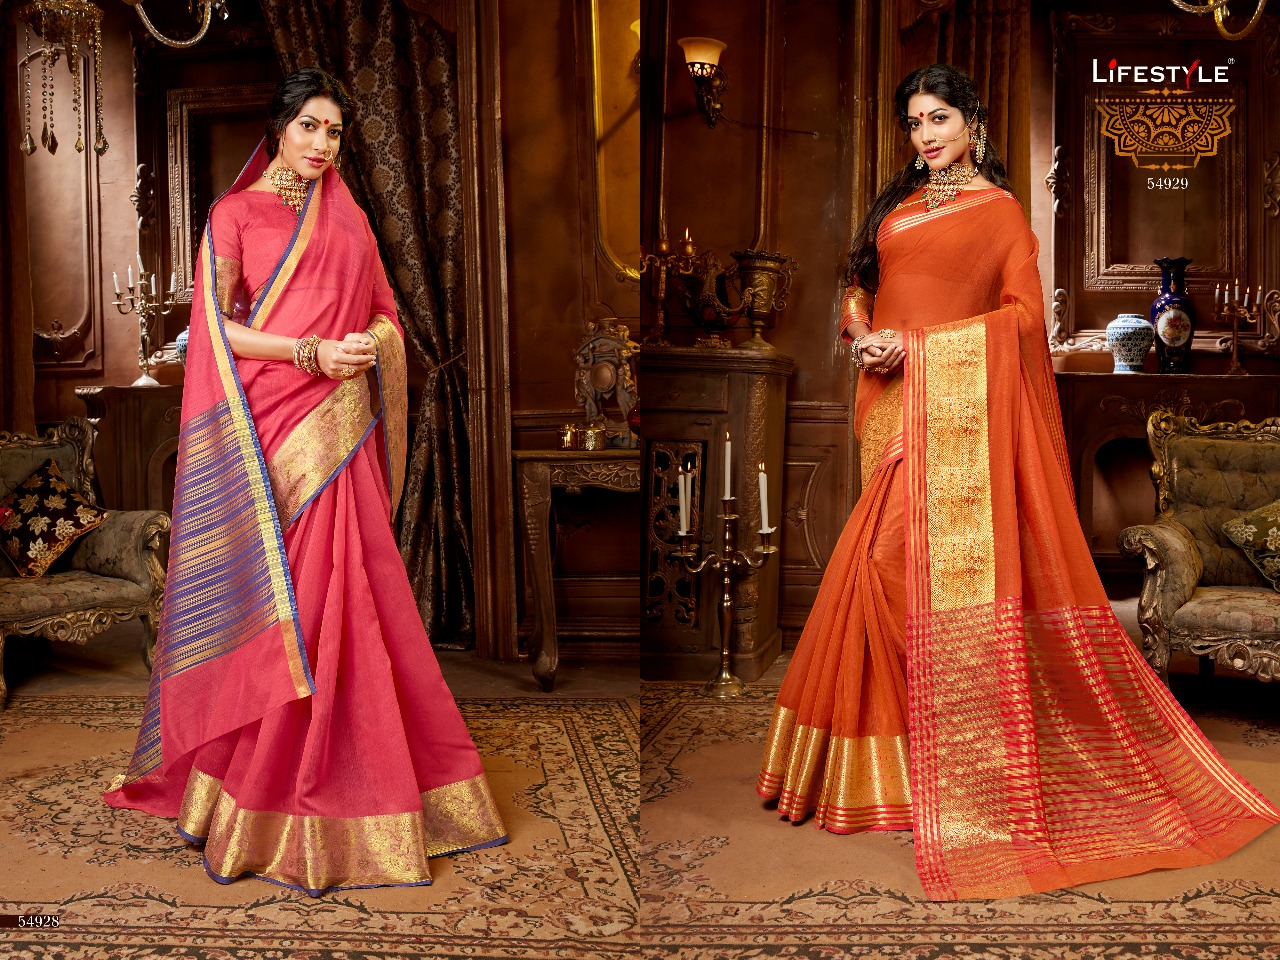 Lifestyle Khadi Silk 54928 54929